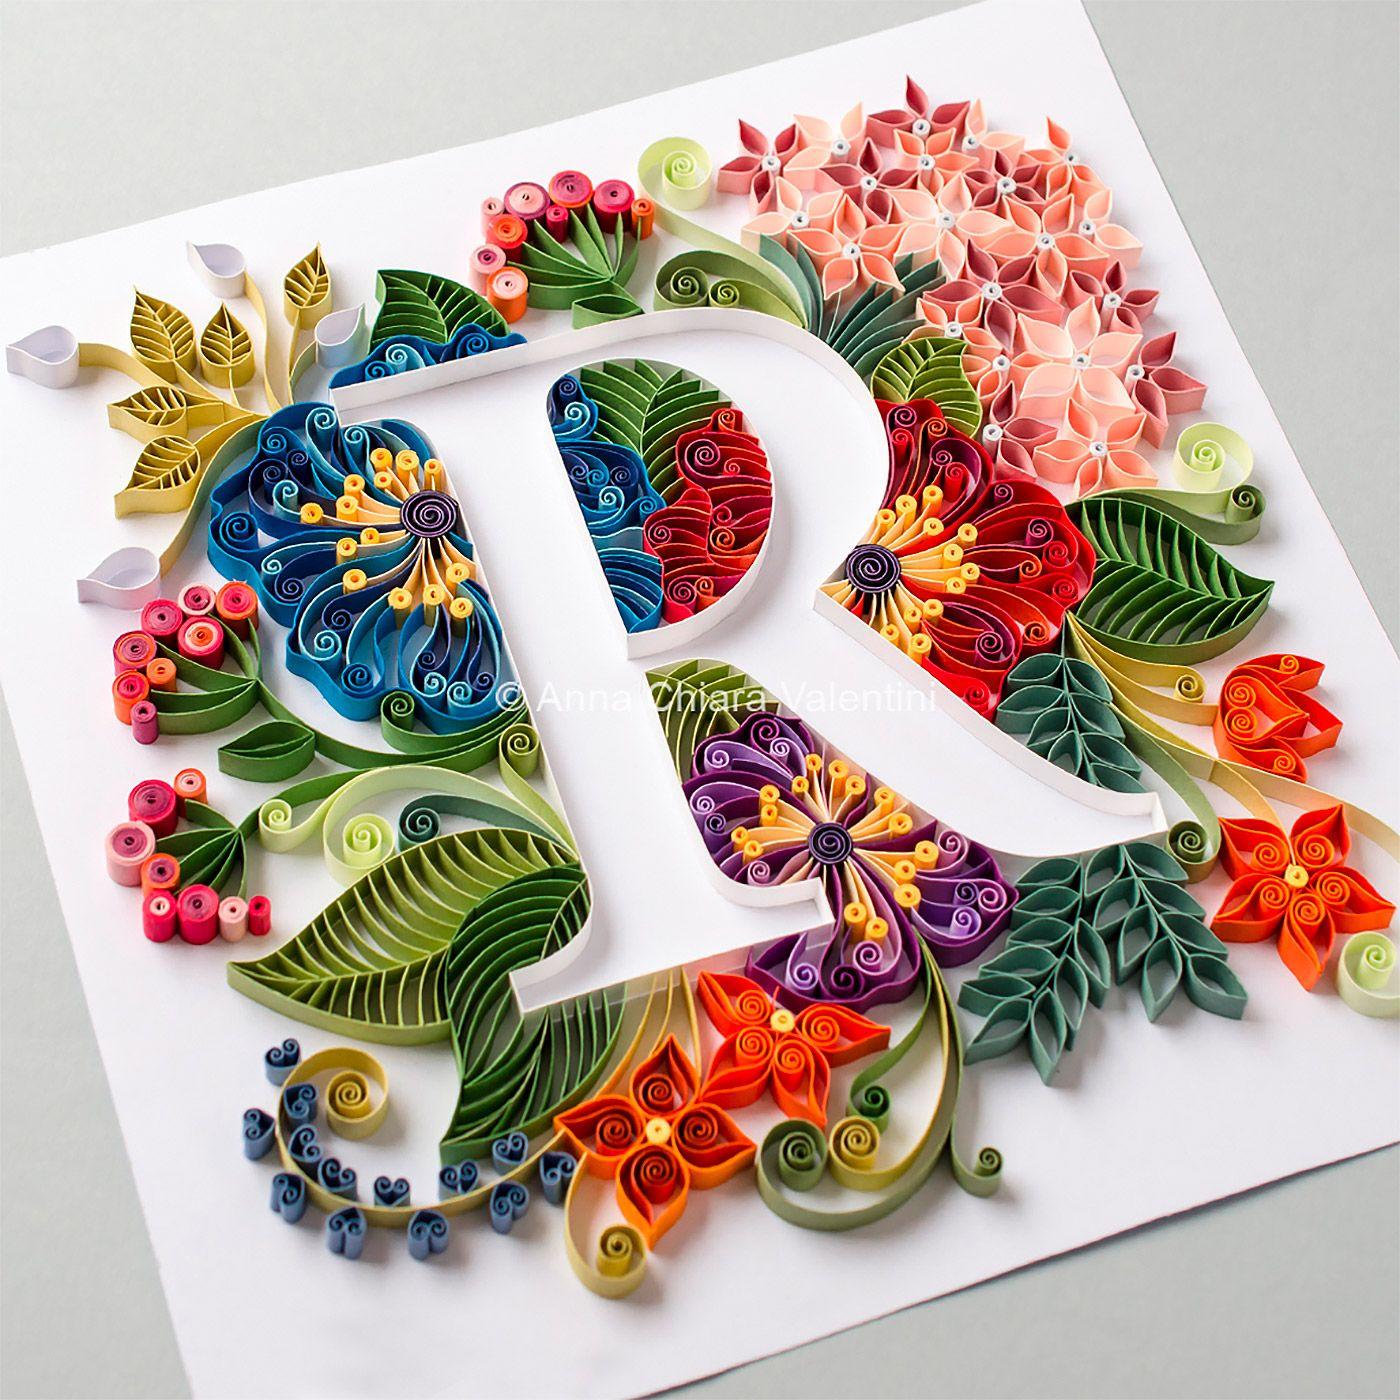 Creative Paper Lettering Artworks by Anna Chiara Valentini | Inspiration Grid